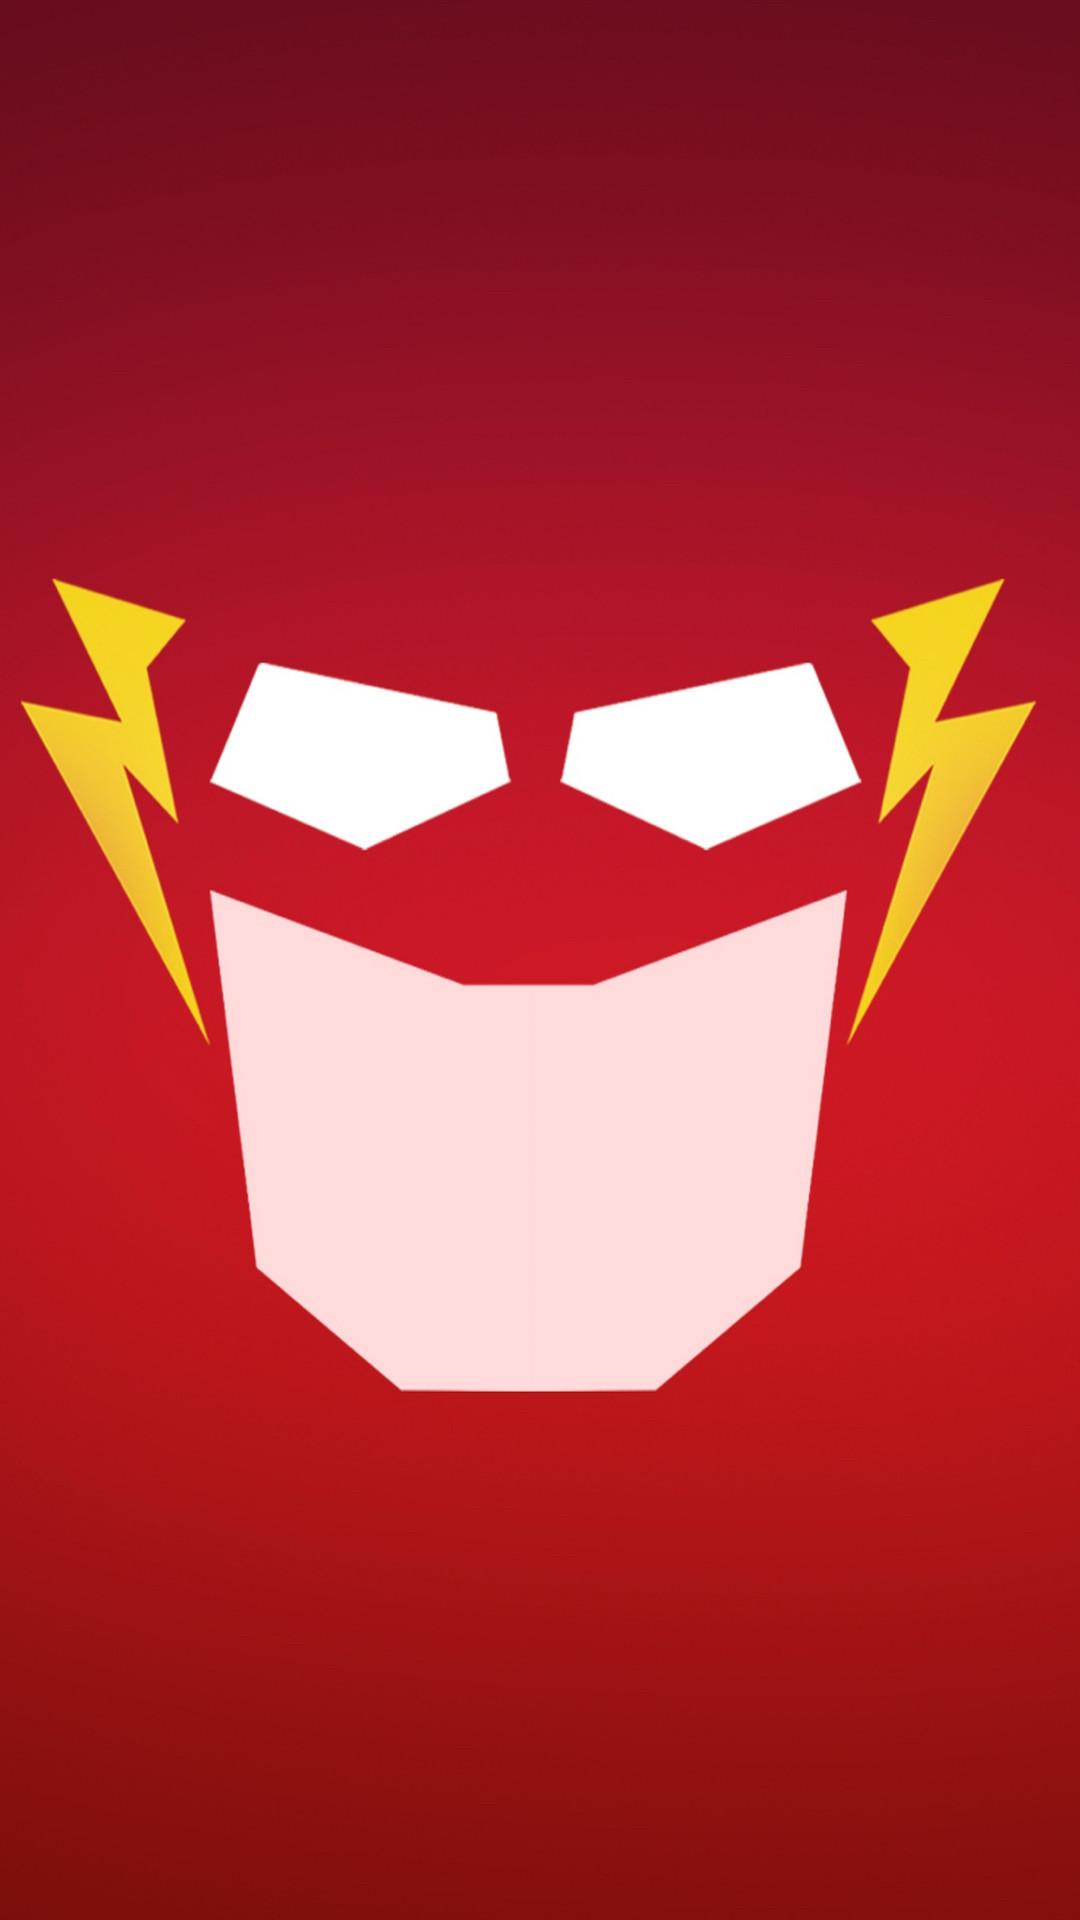 Wallpaper Weekends: The Flash Returns!